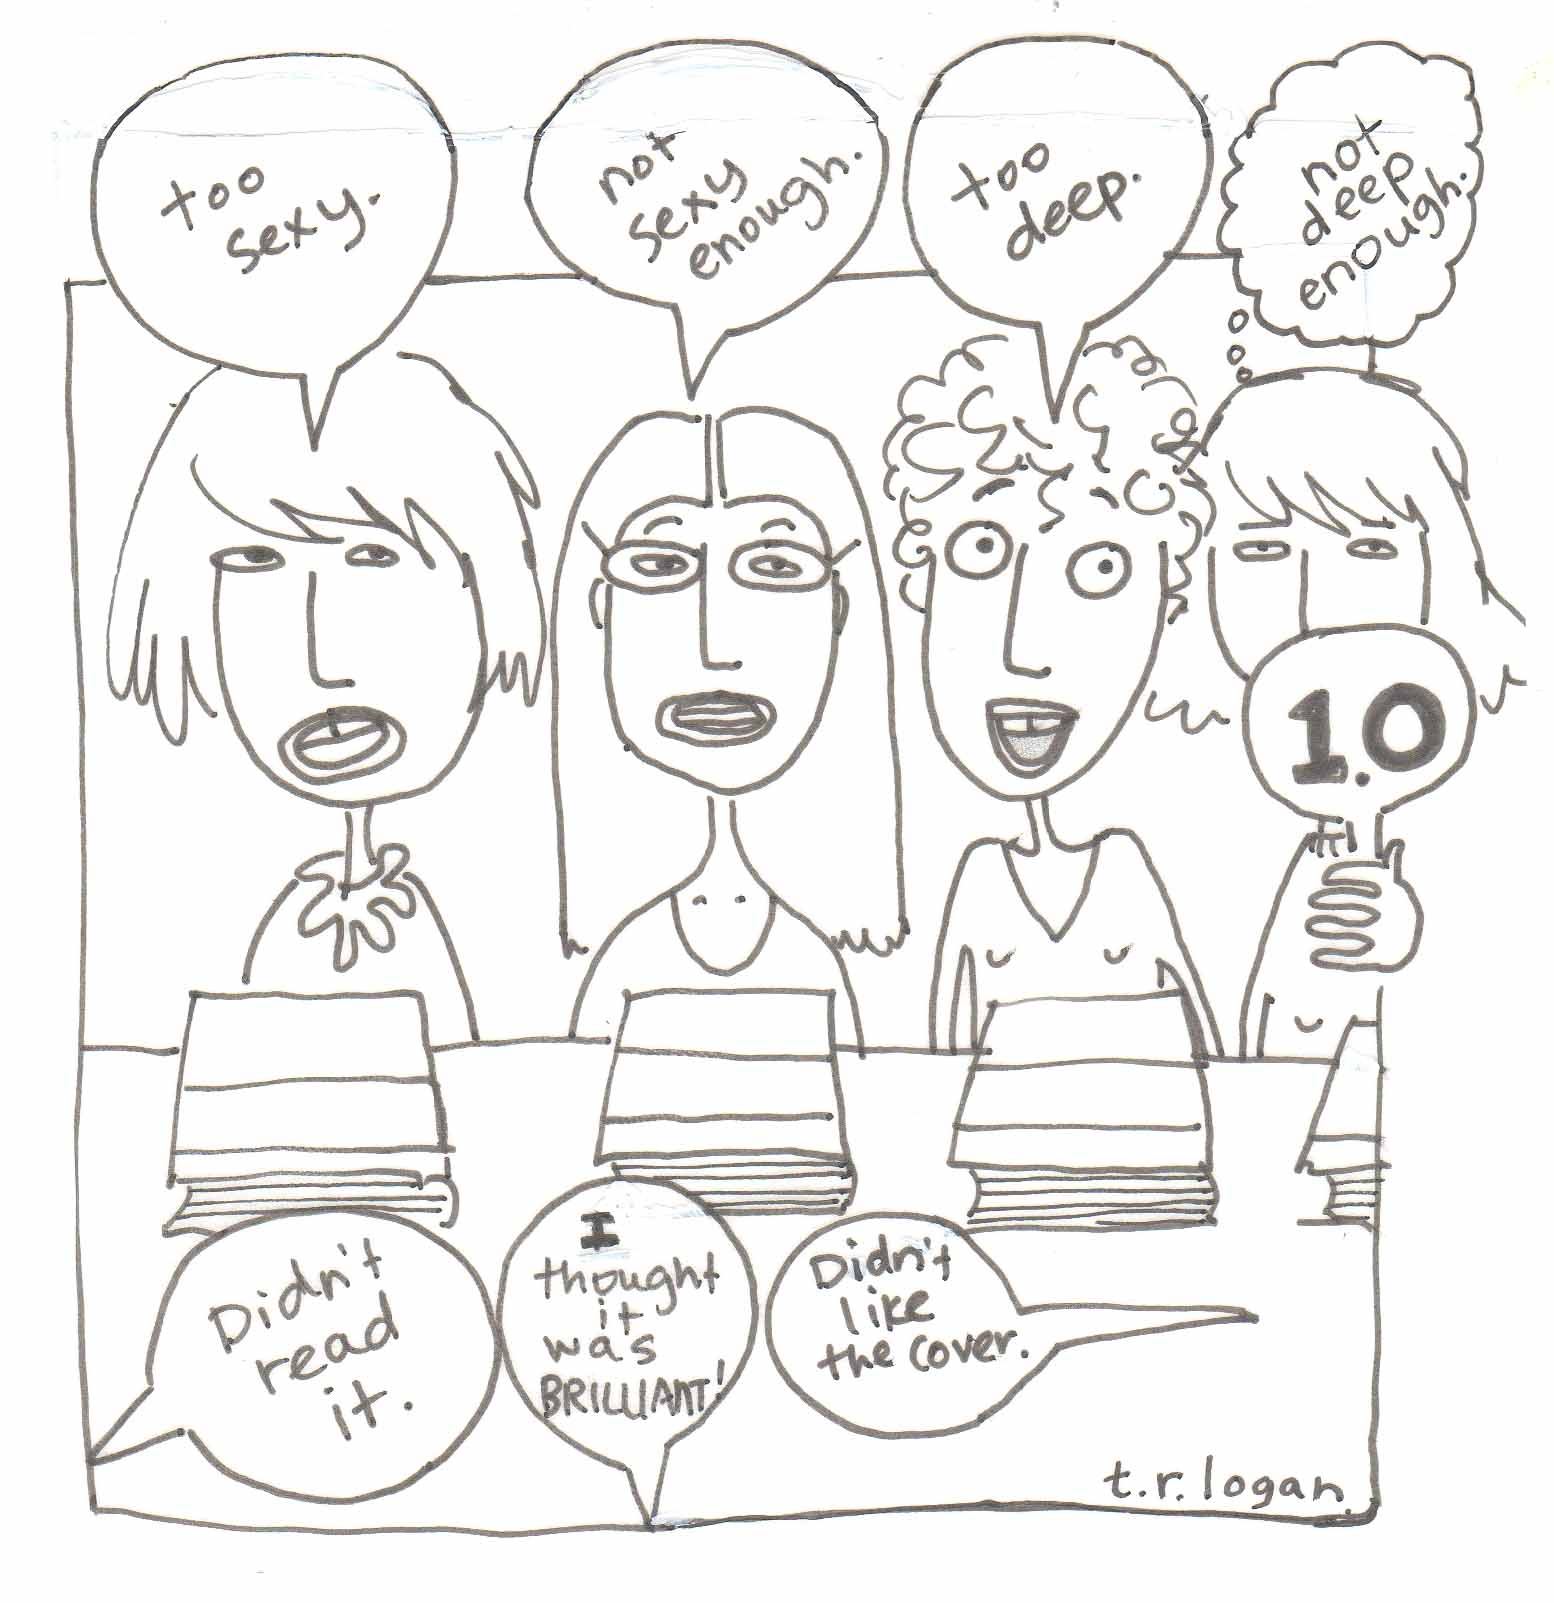 cartoonBookGroup087.jpg